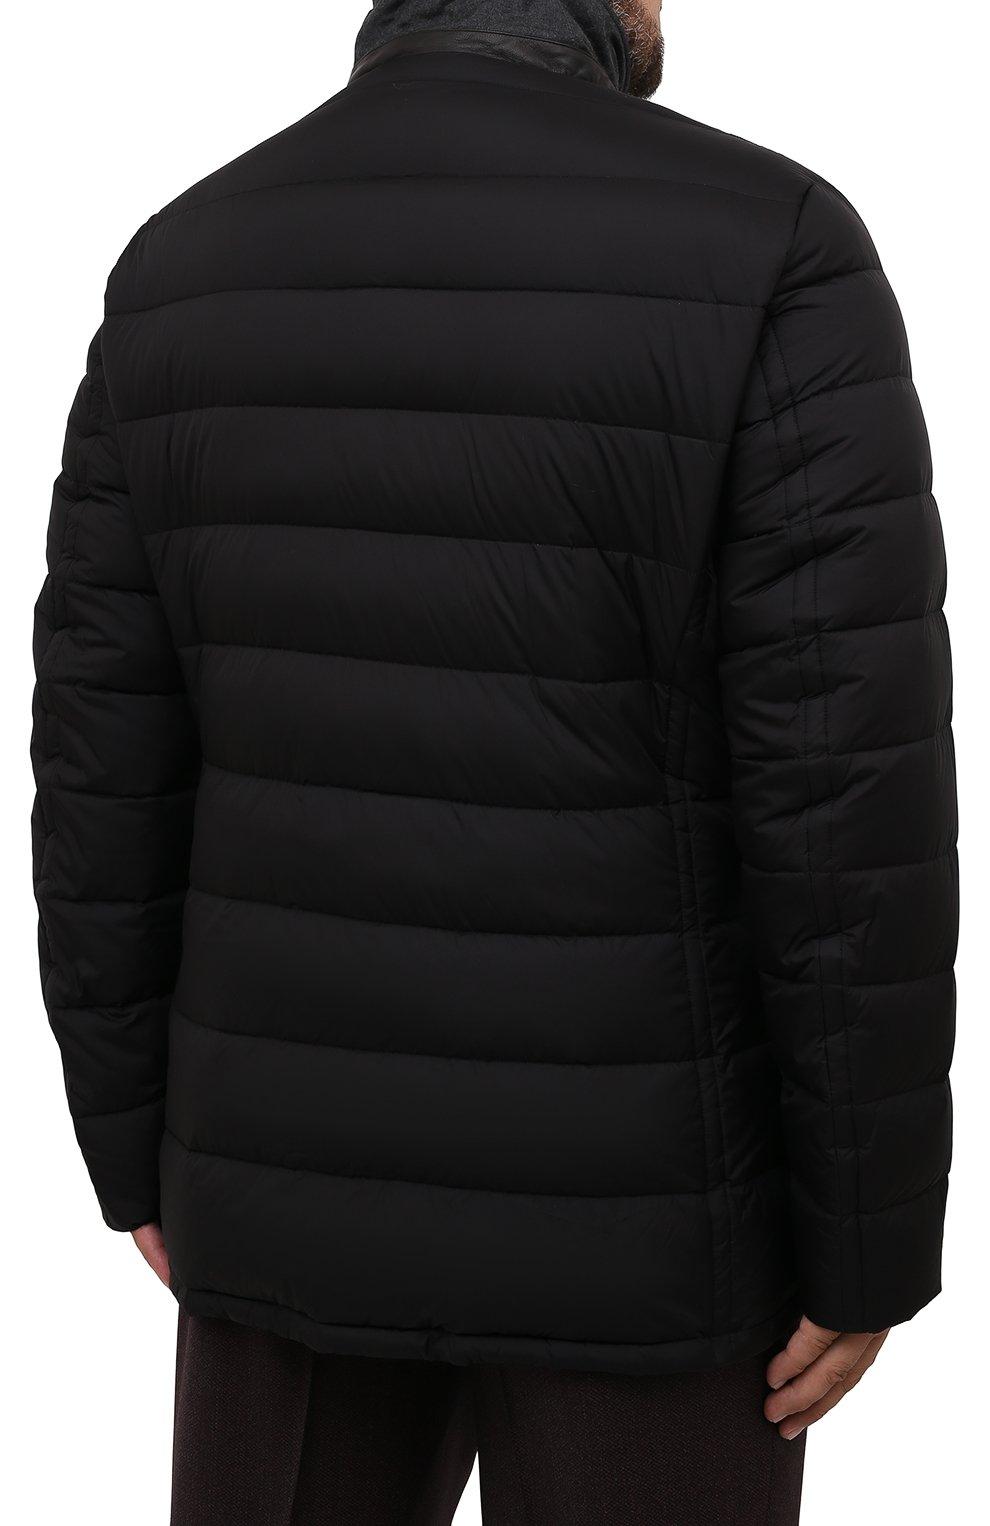 Мужская пуховая куртка zayn-op MOORER черного цвета, арт. ZAYN-0P/M0UGI100307-TEPA017/60-68   Фото 4 (Кросс-КТ: Куртка, Пуховик; Мужское Кросс-КТ: пуховик-короткий; Рукава: Длинные; Материал внешний: Синтетический материал; Стили: Классический; Материал подклада: Синтетический материал)